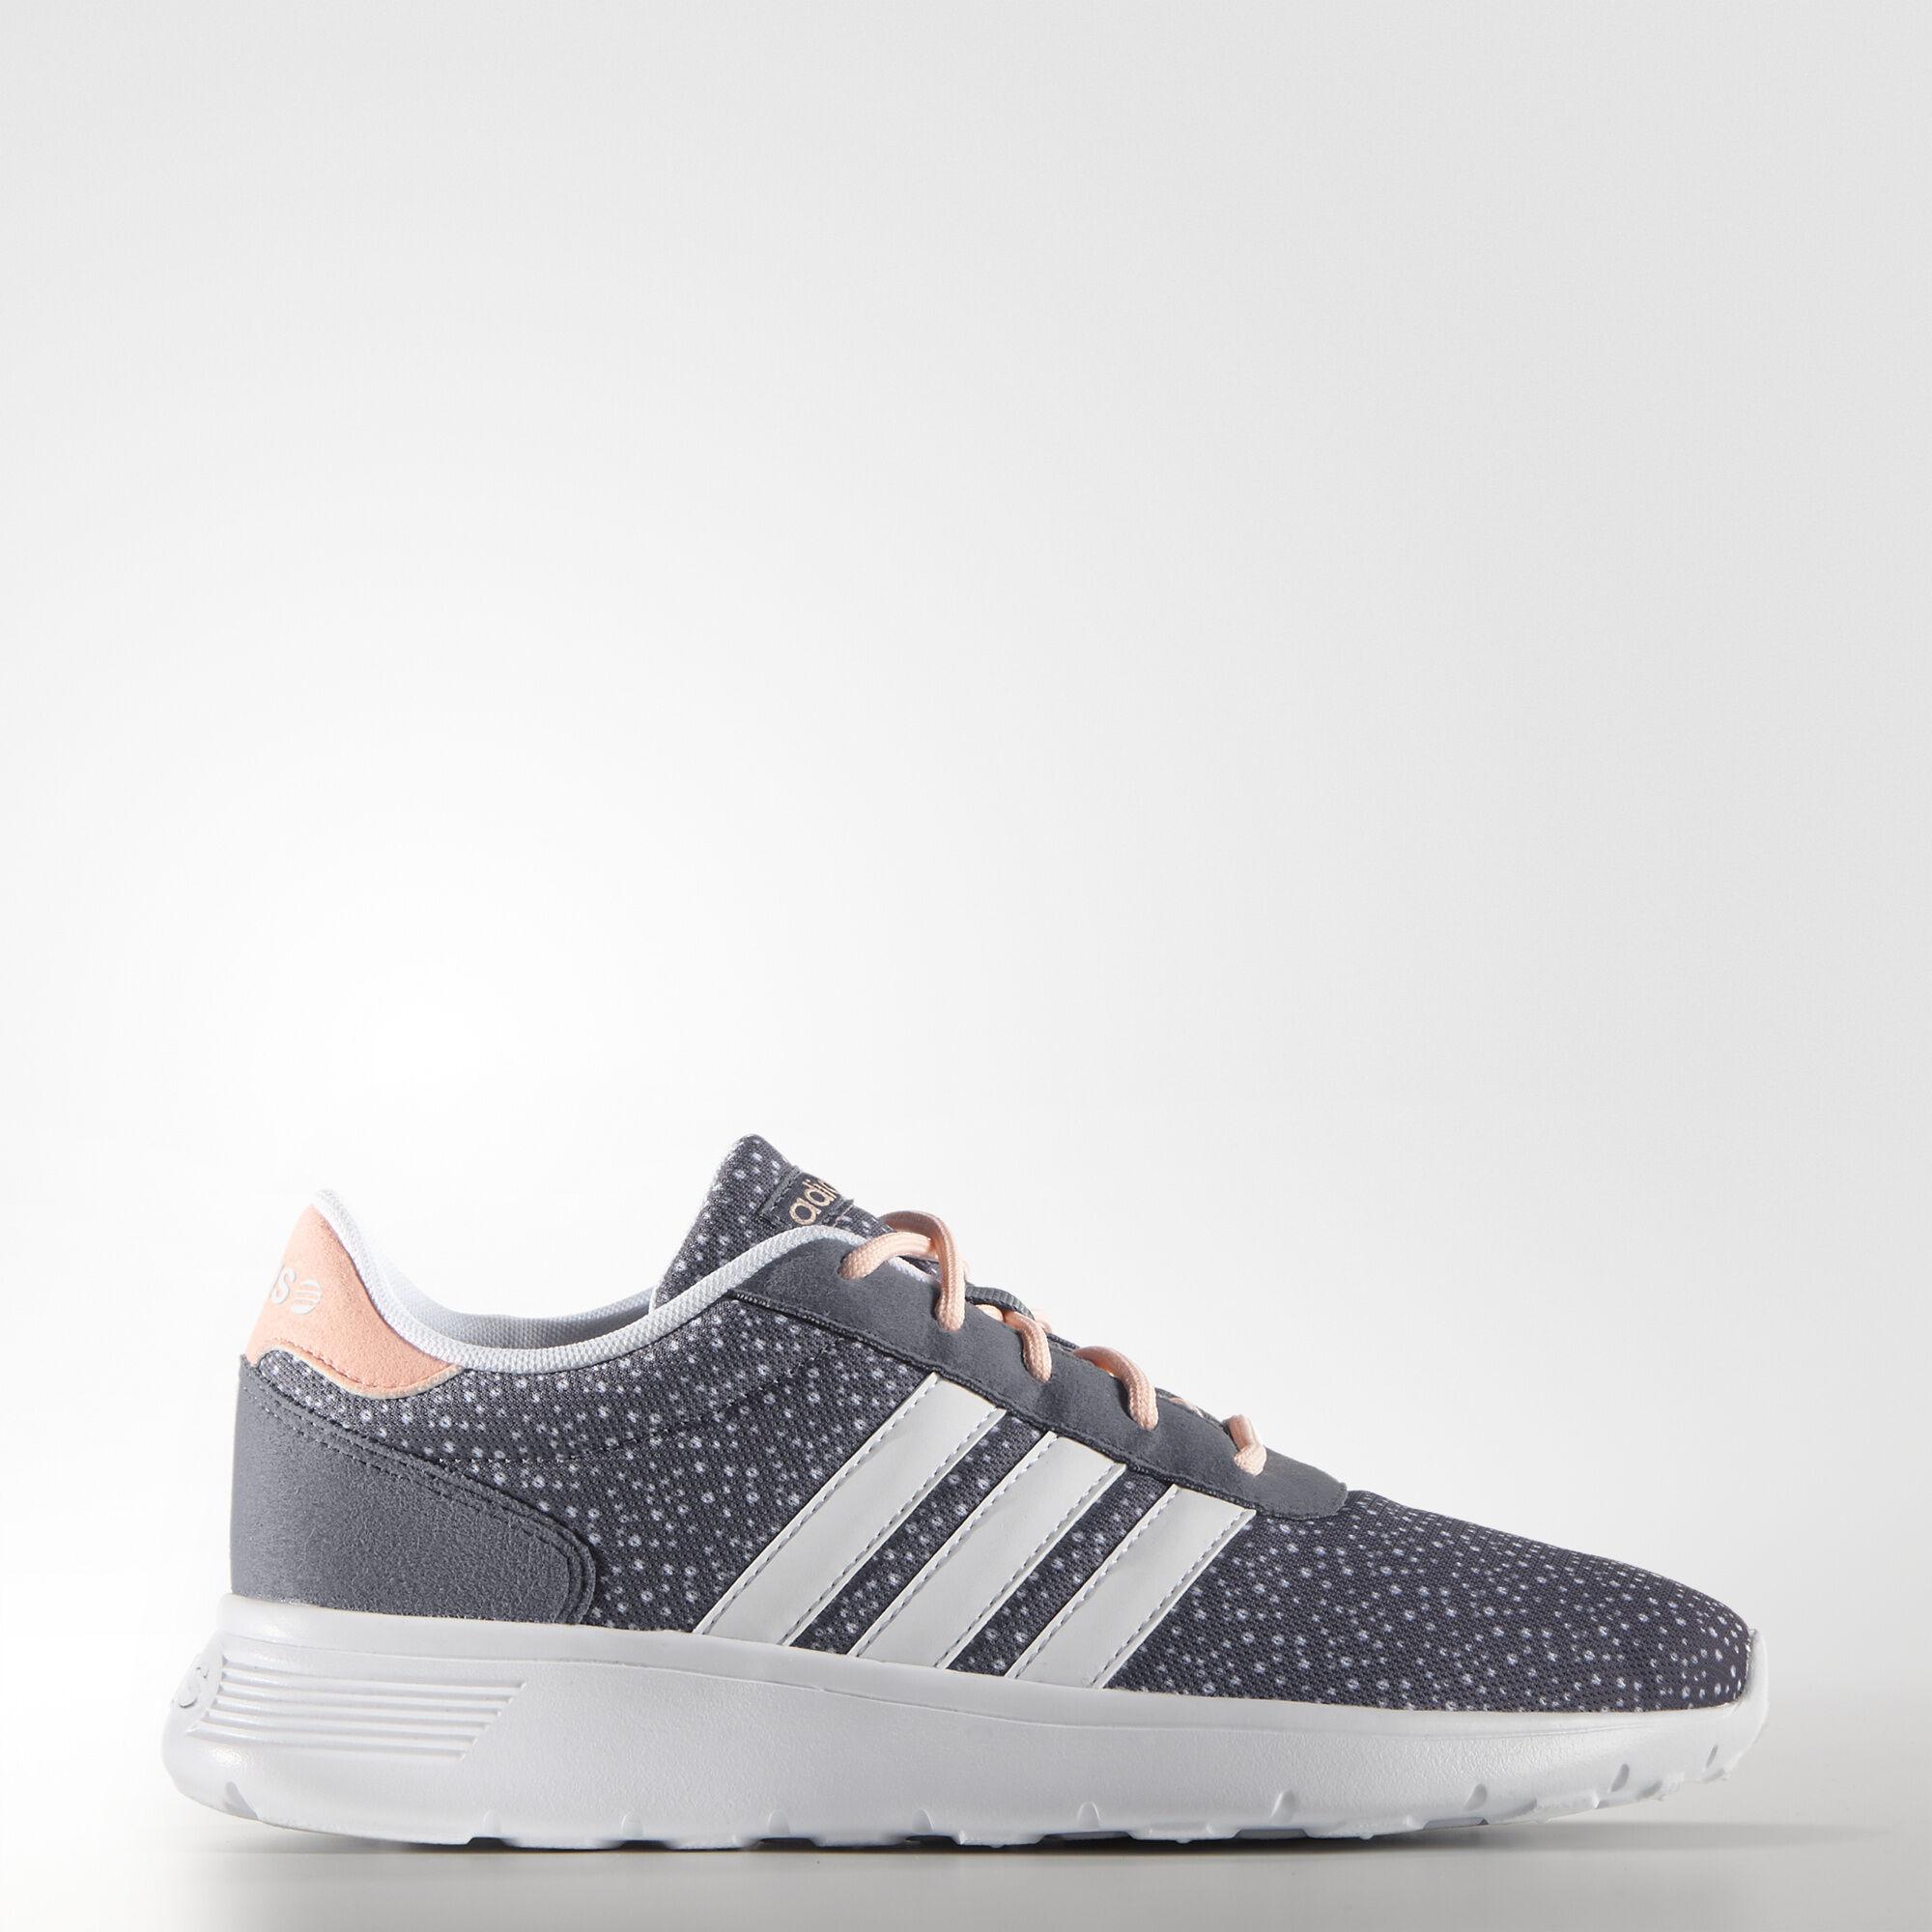 Adidas Neo Lite Racer Womens Grey